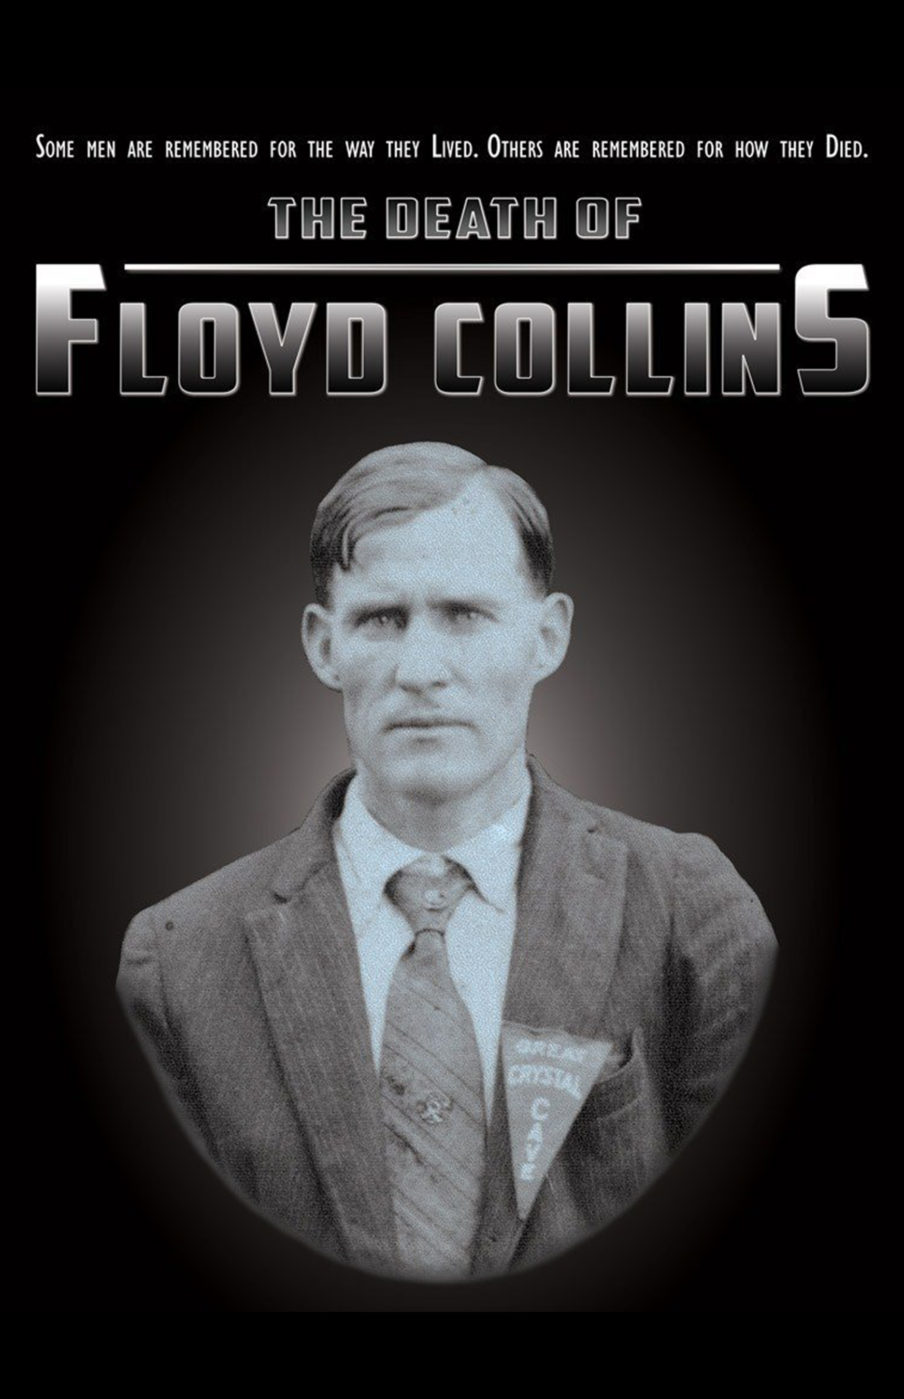 Death of Floyd Collins